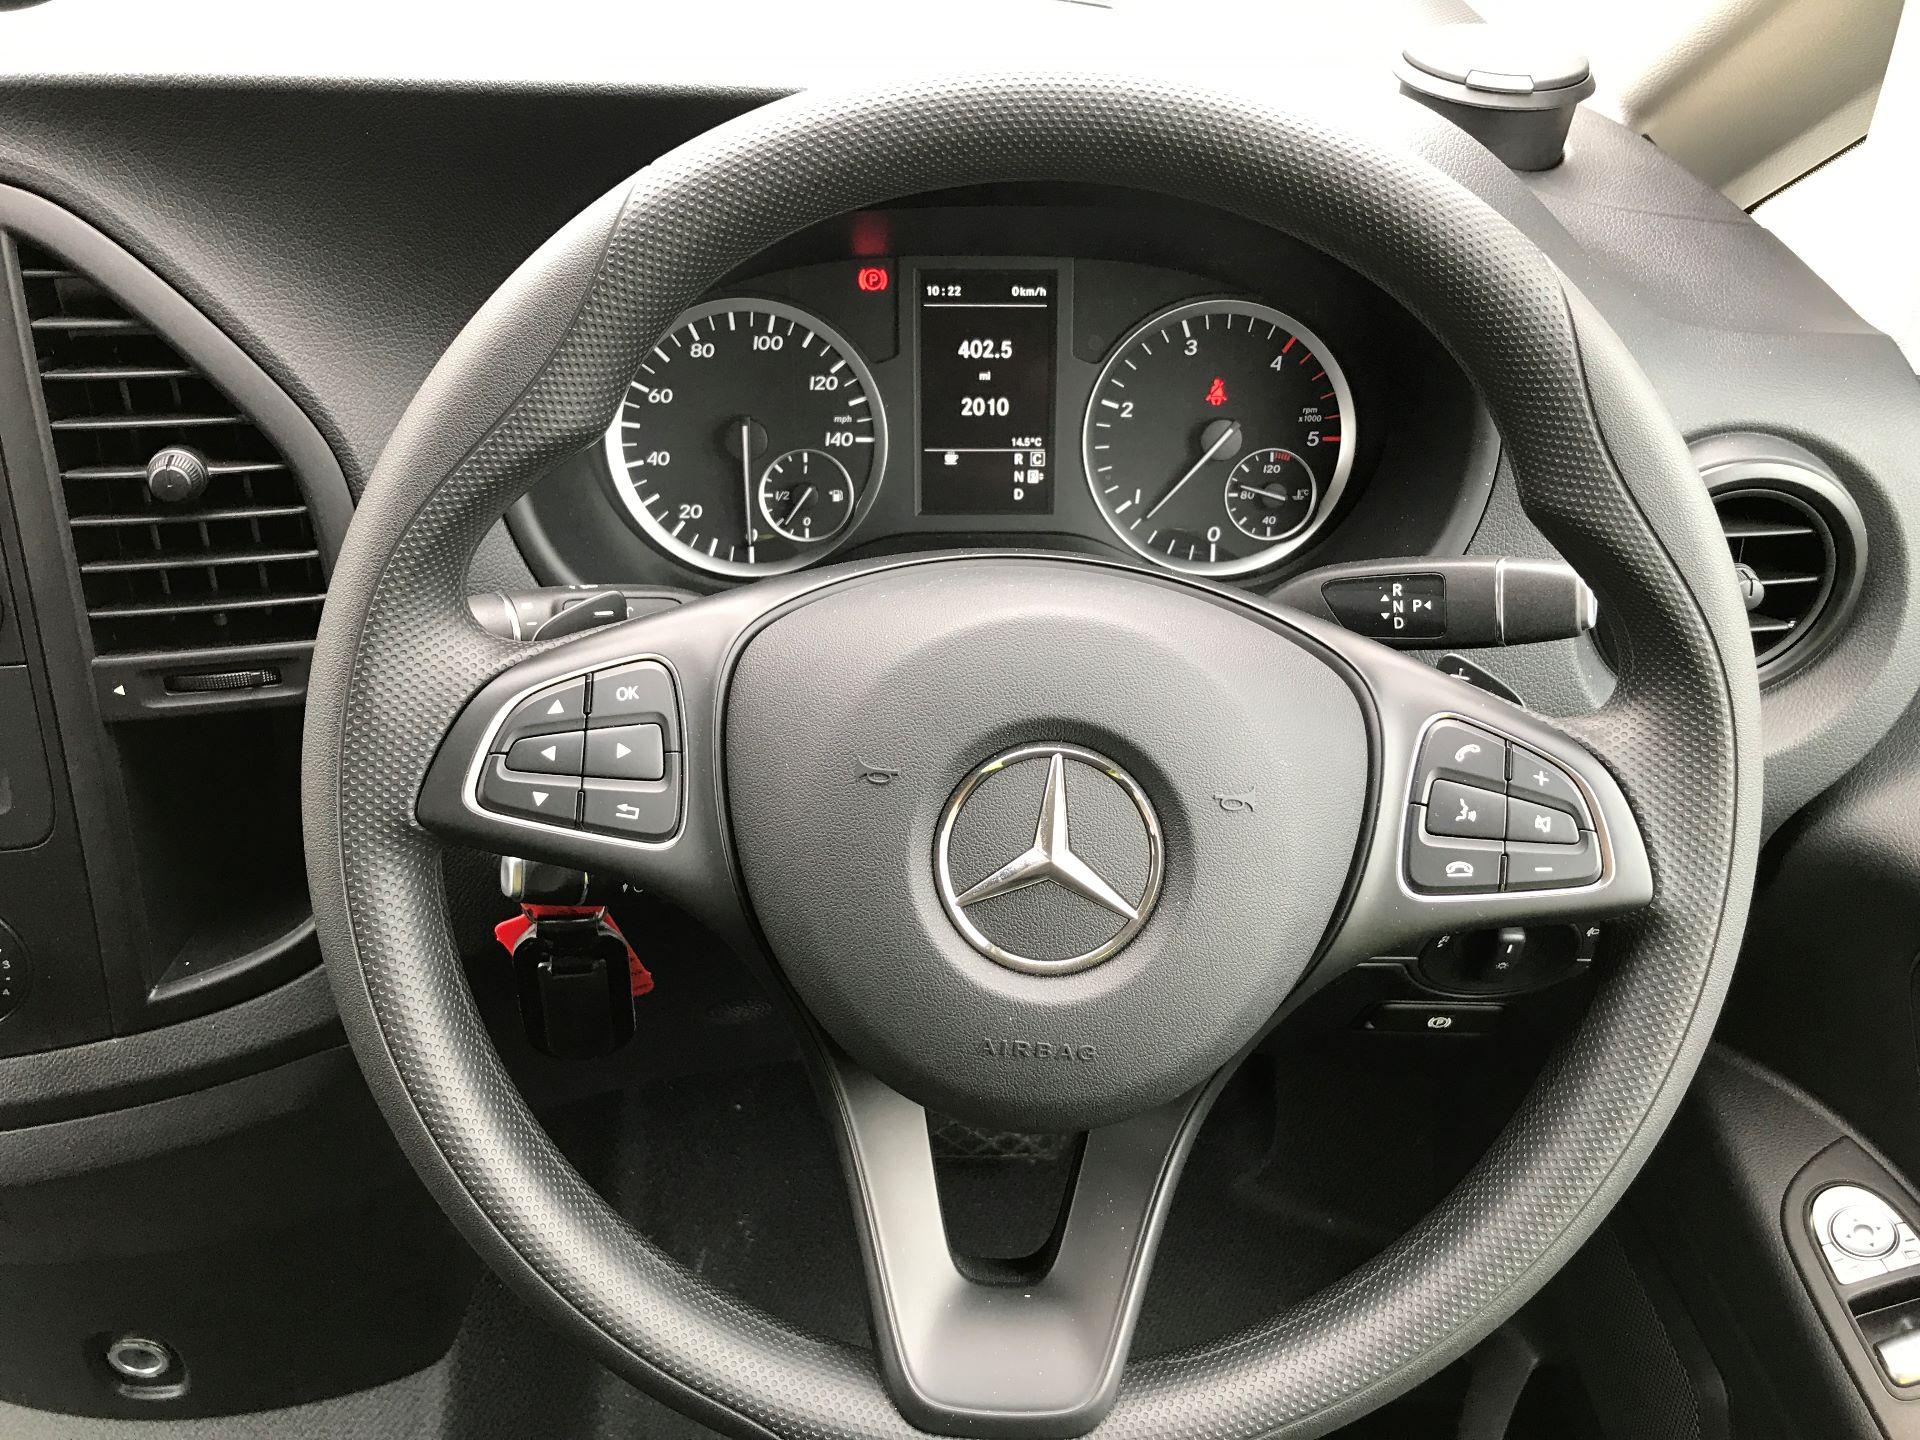 2018 Mercedes-Benz Vito 119CDI COMPACT BLUETECH 190PS DUALINER SPORT AUTOMATIC EURO 6 (YS18KAJ) Image 4